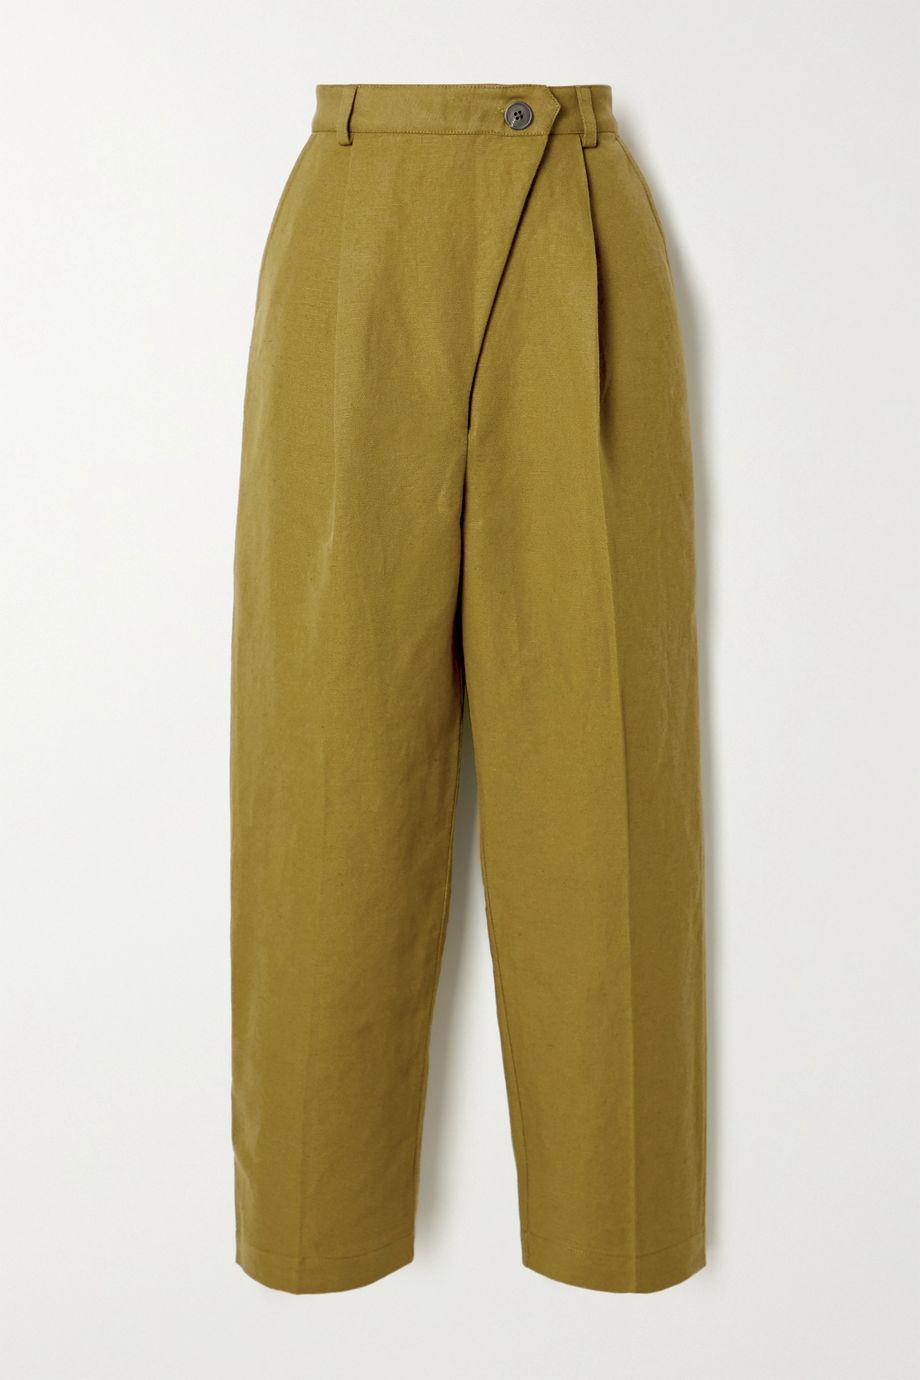 Mara Hoffman + NET SUSTAIN Almeria pleated linen and organic cotton-blend straight-leg pants